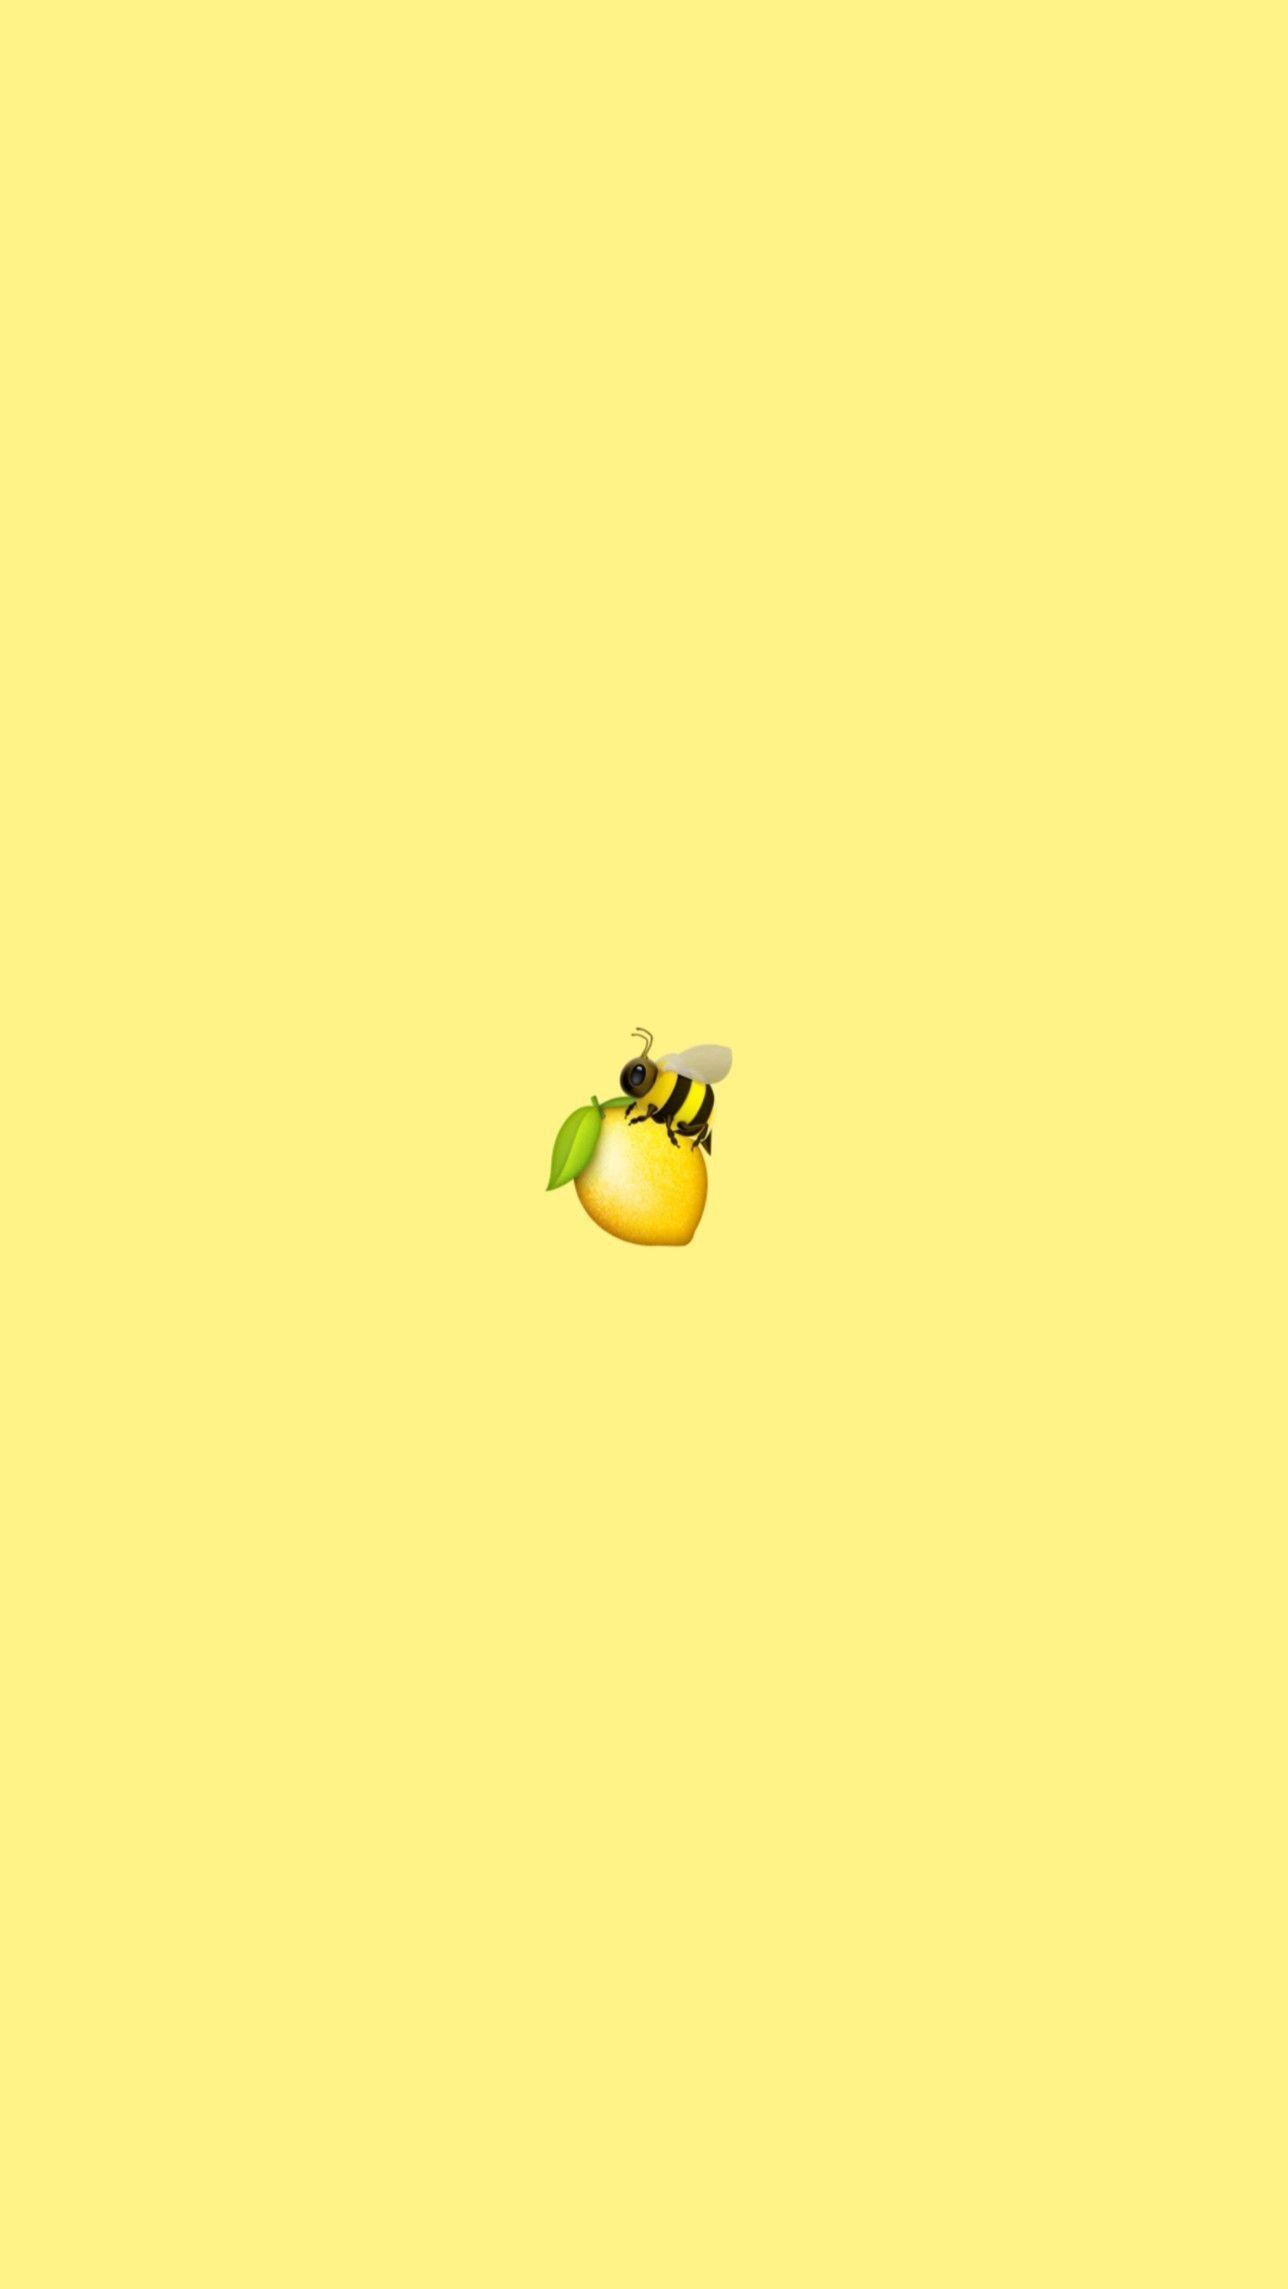 Aesthetic Emoji Wallpapers Top Free Aesthetic Emoji Backgrounds